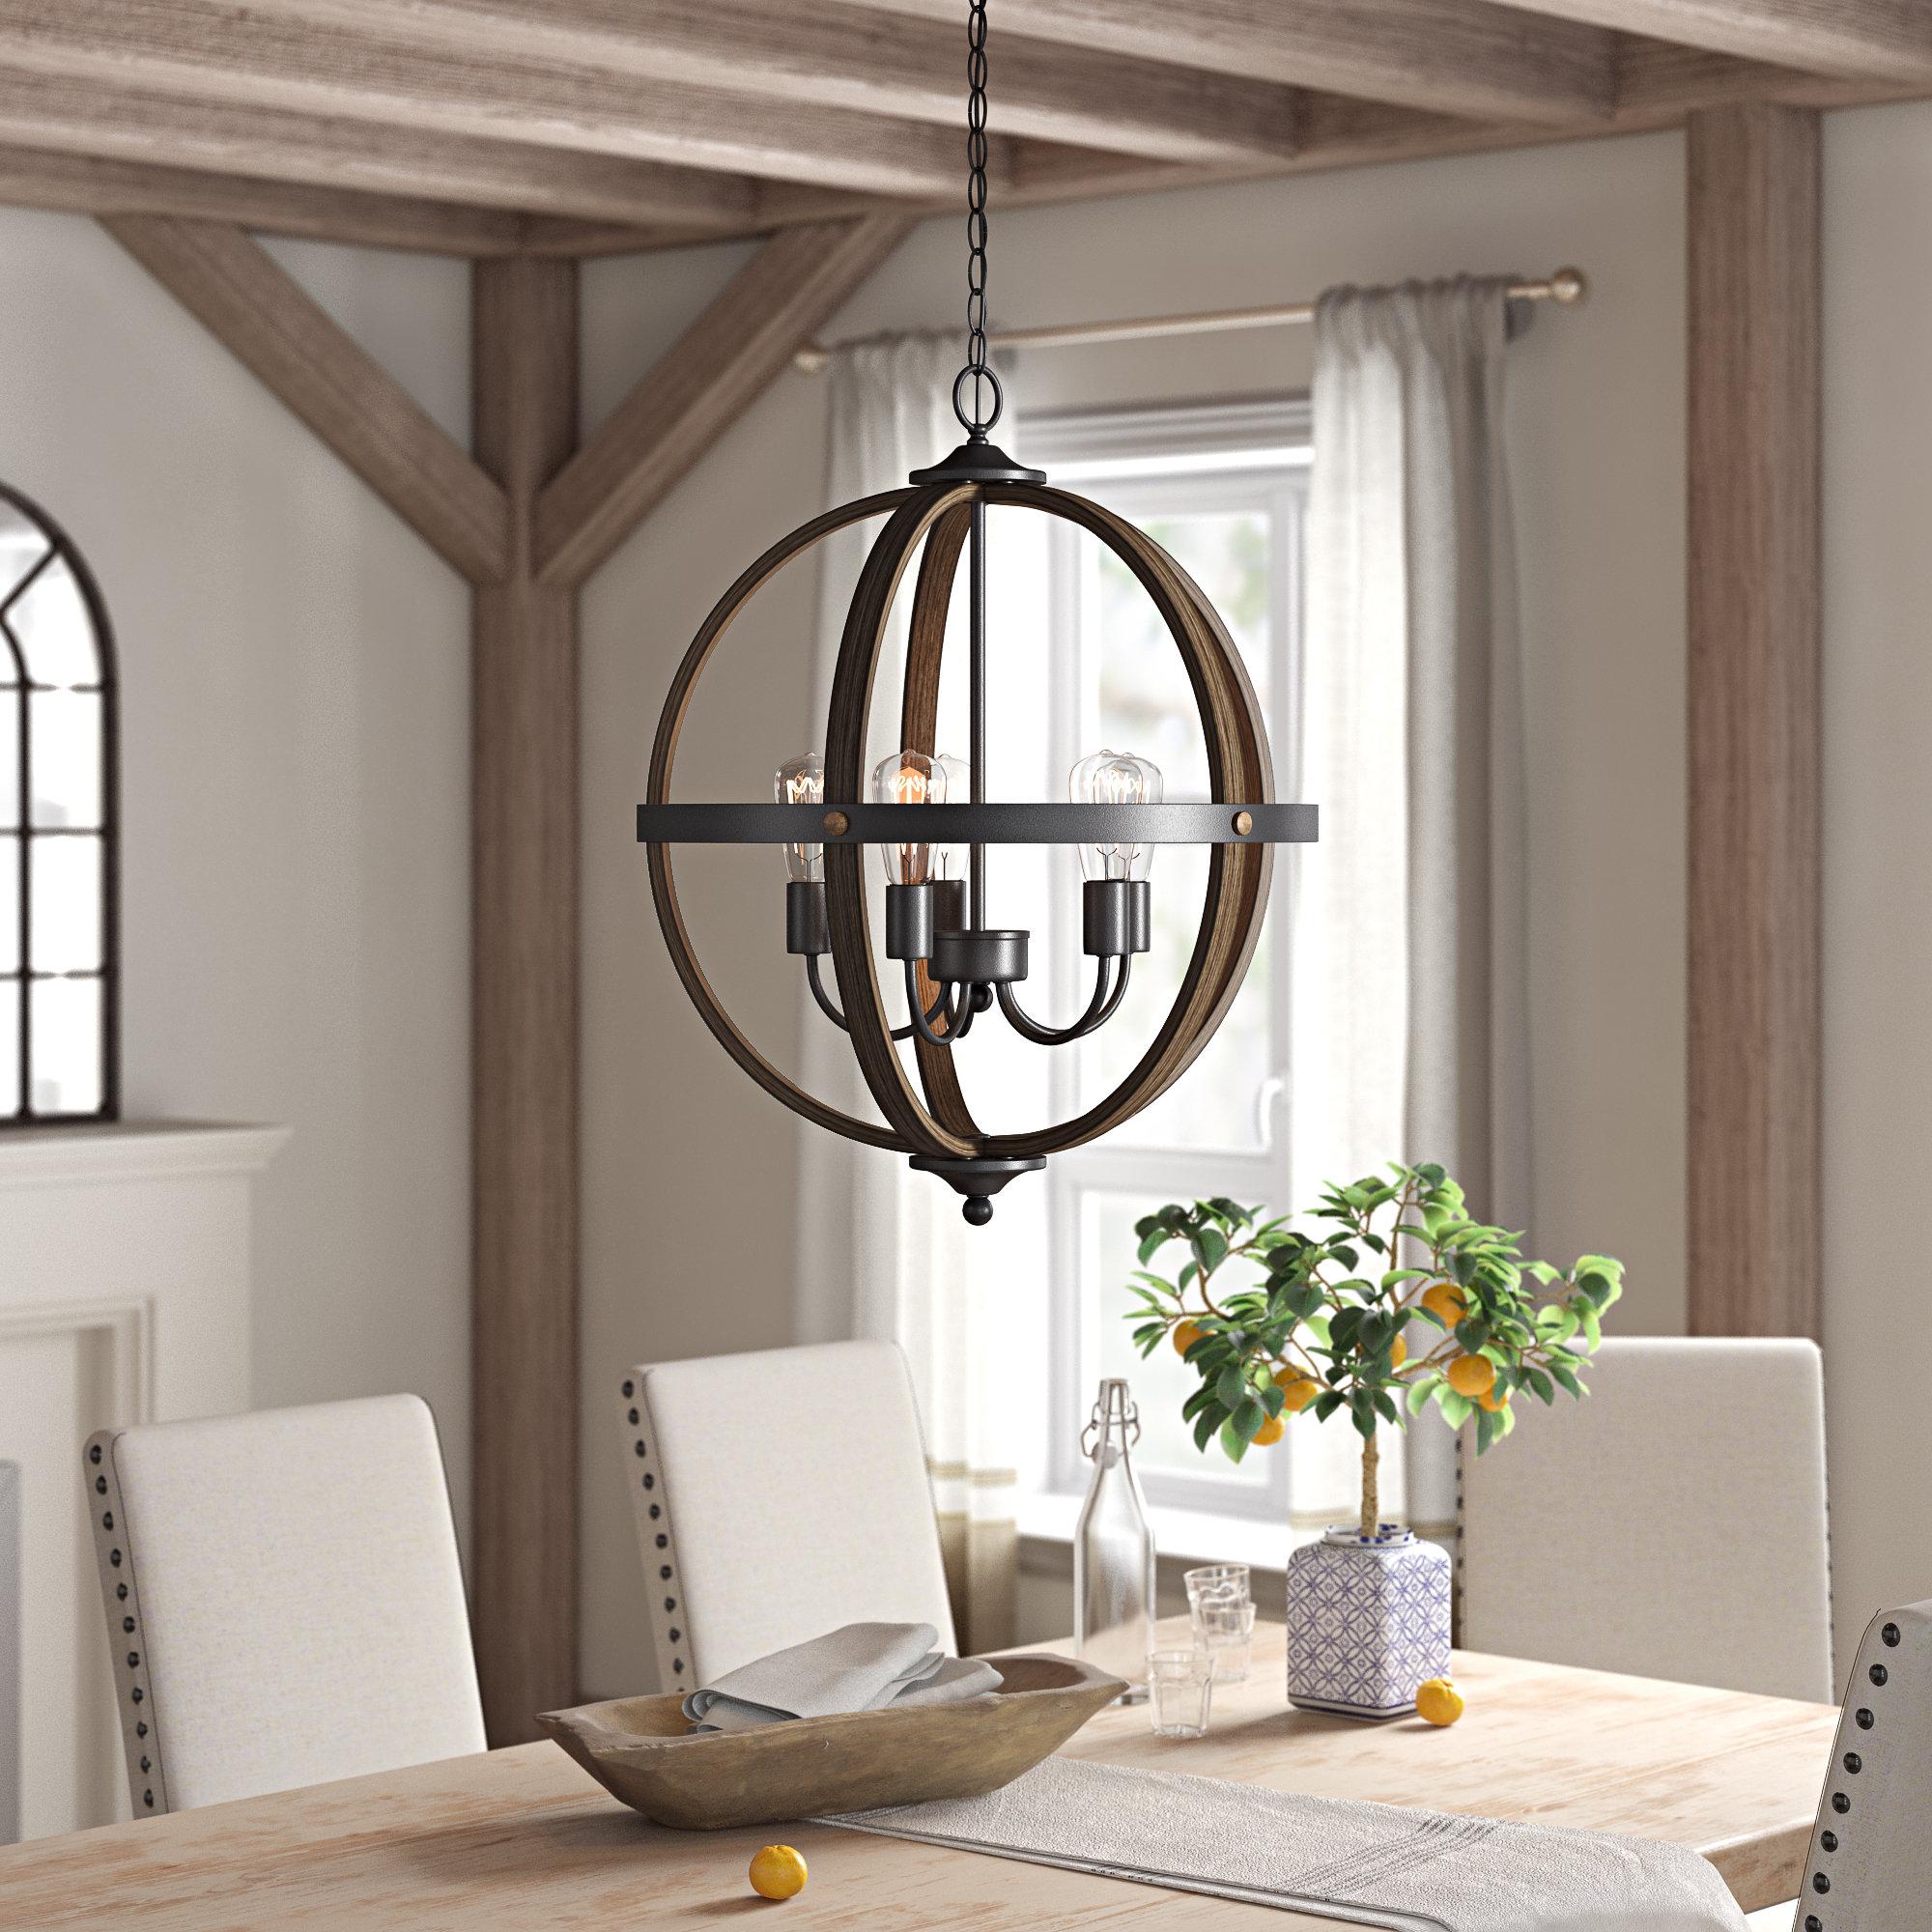 2020 Filipe Globe Chandeliers Pertaining To Makeba 5 Light Globe Chandelier (View 20 of 25)